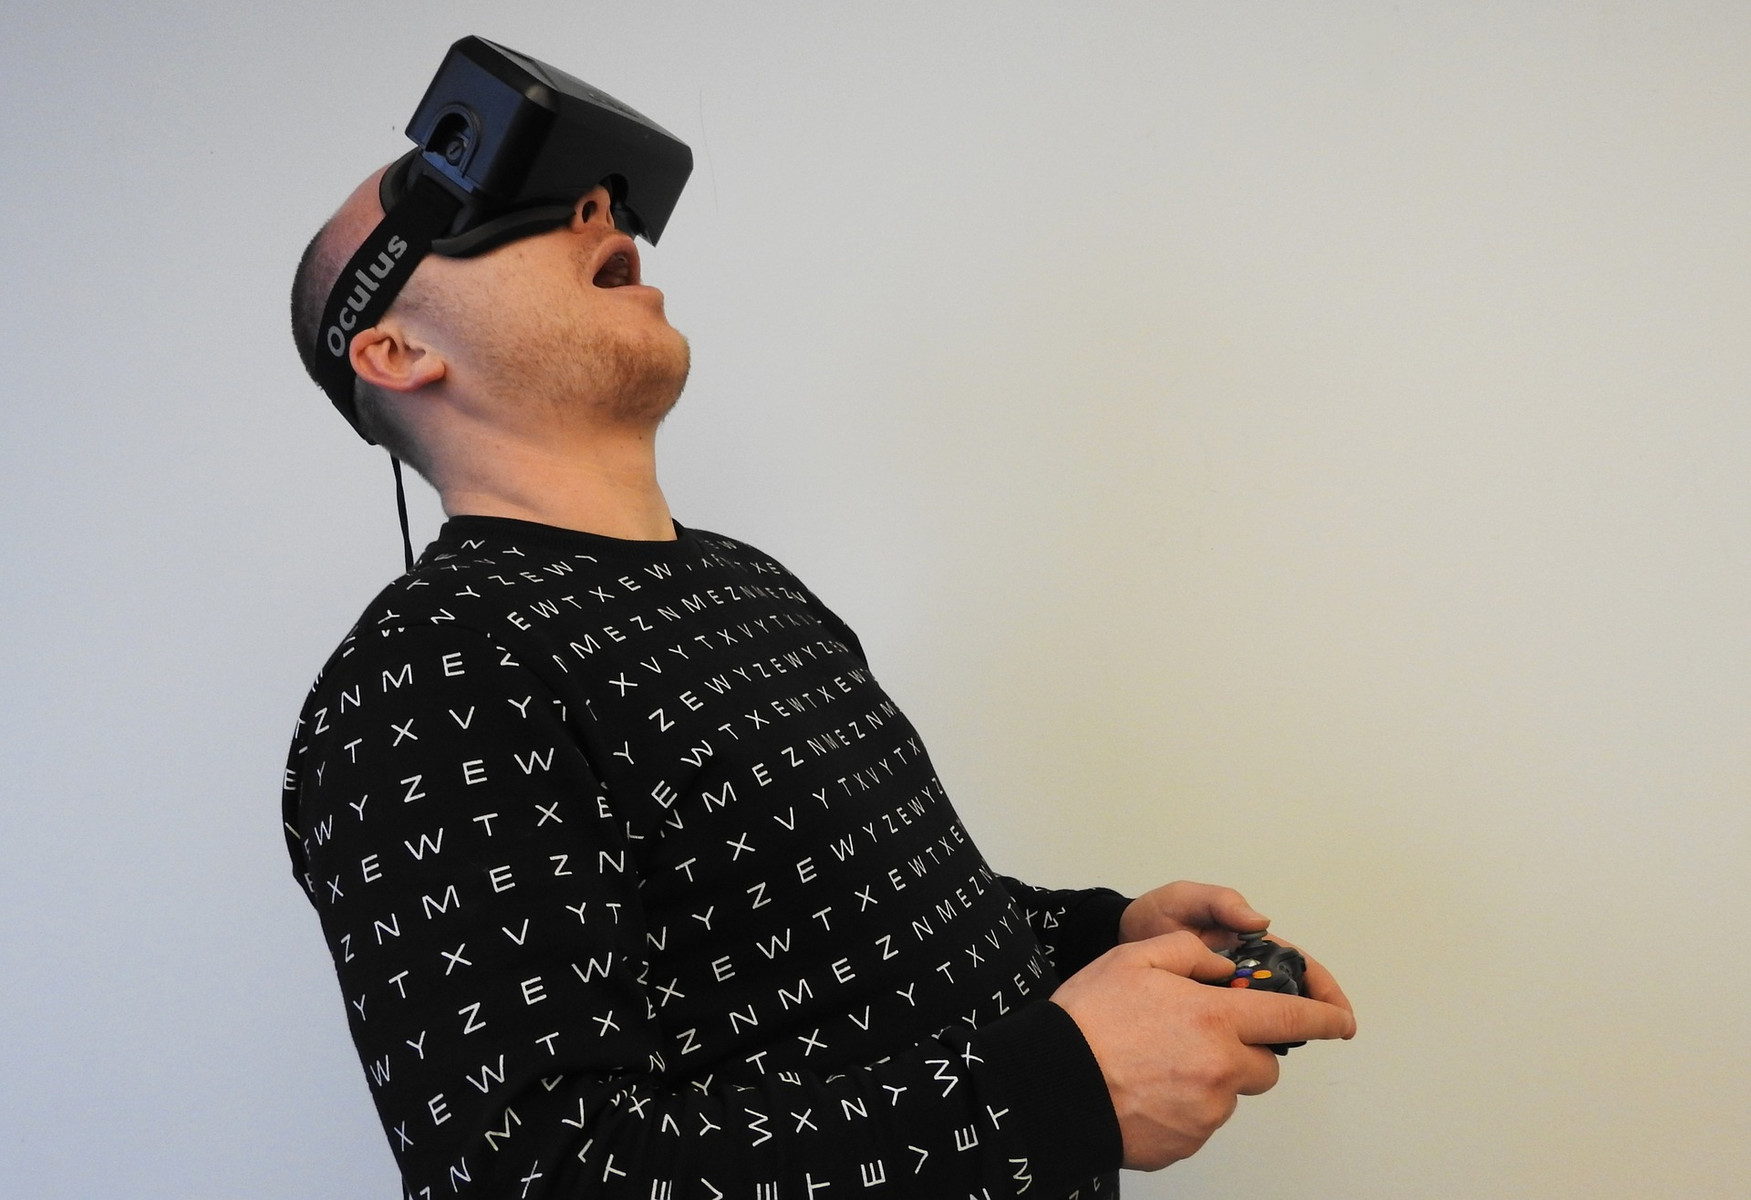 VR: Oculus senkt den Preis der Rift auf PS VR-Niveau